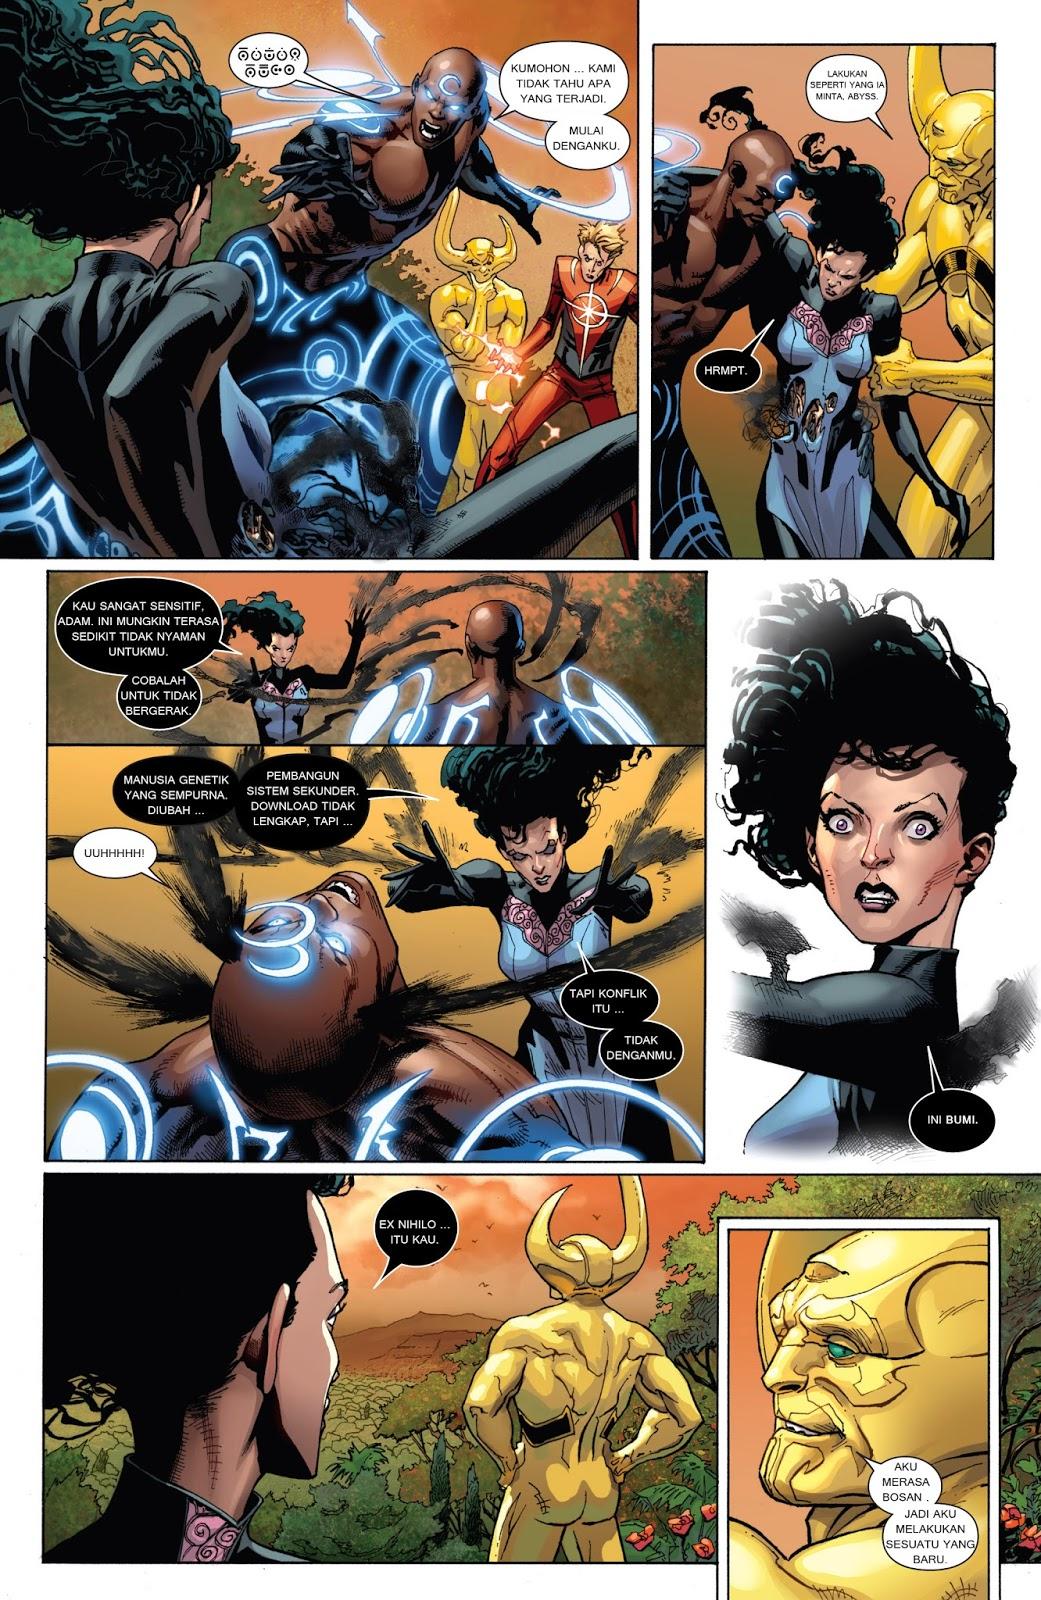 komik amerika bahasa indonesia: avengers #9